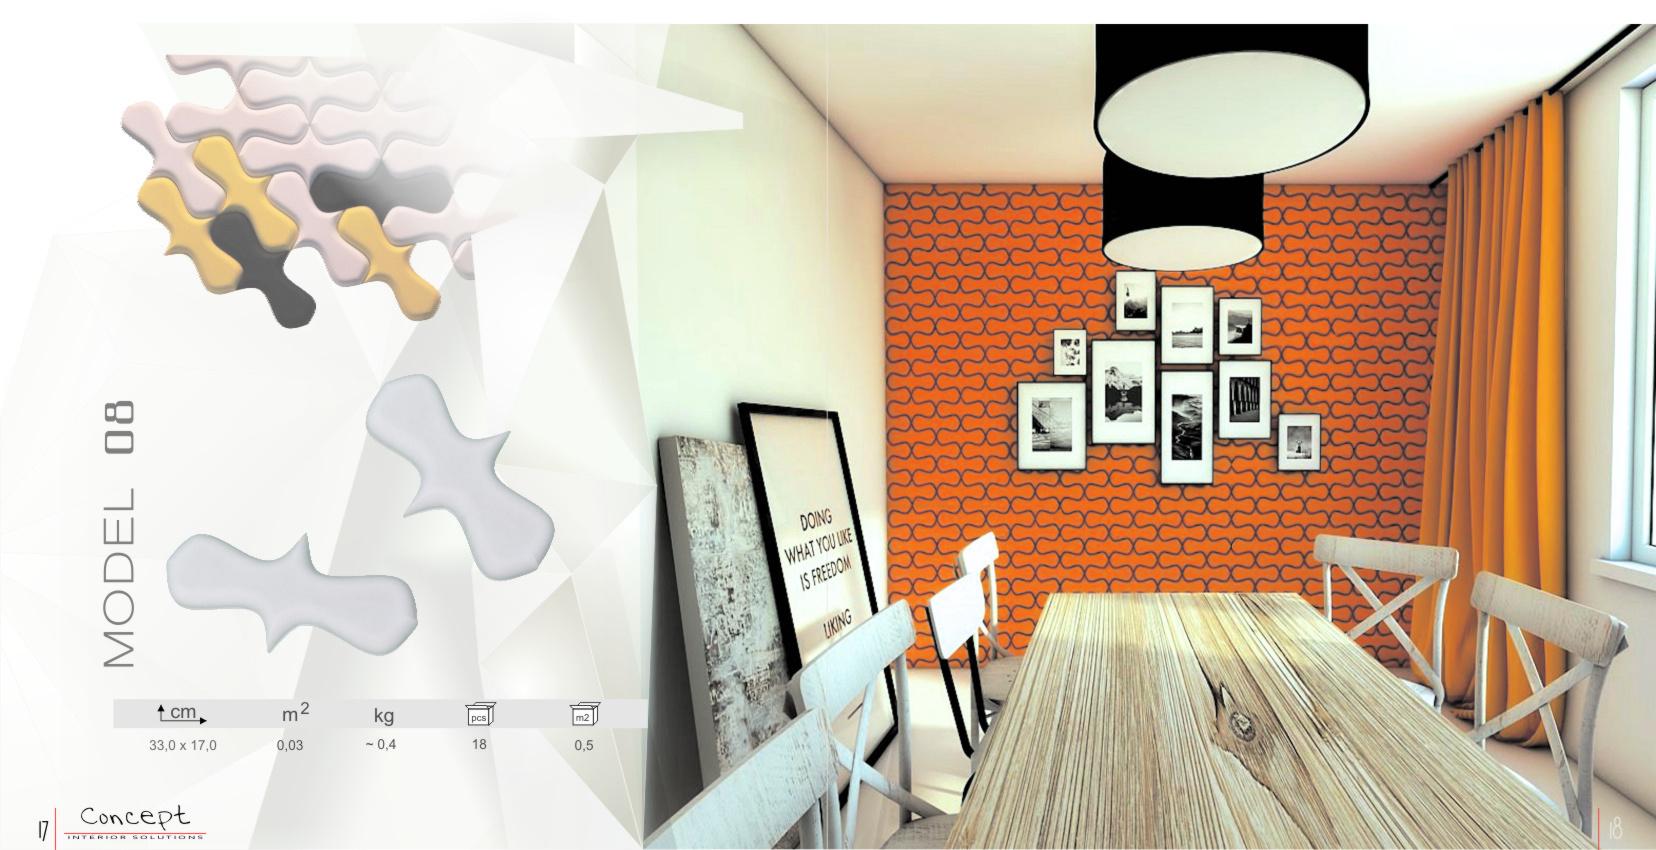 katalog panele gipsowe  Concept str10